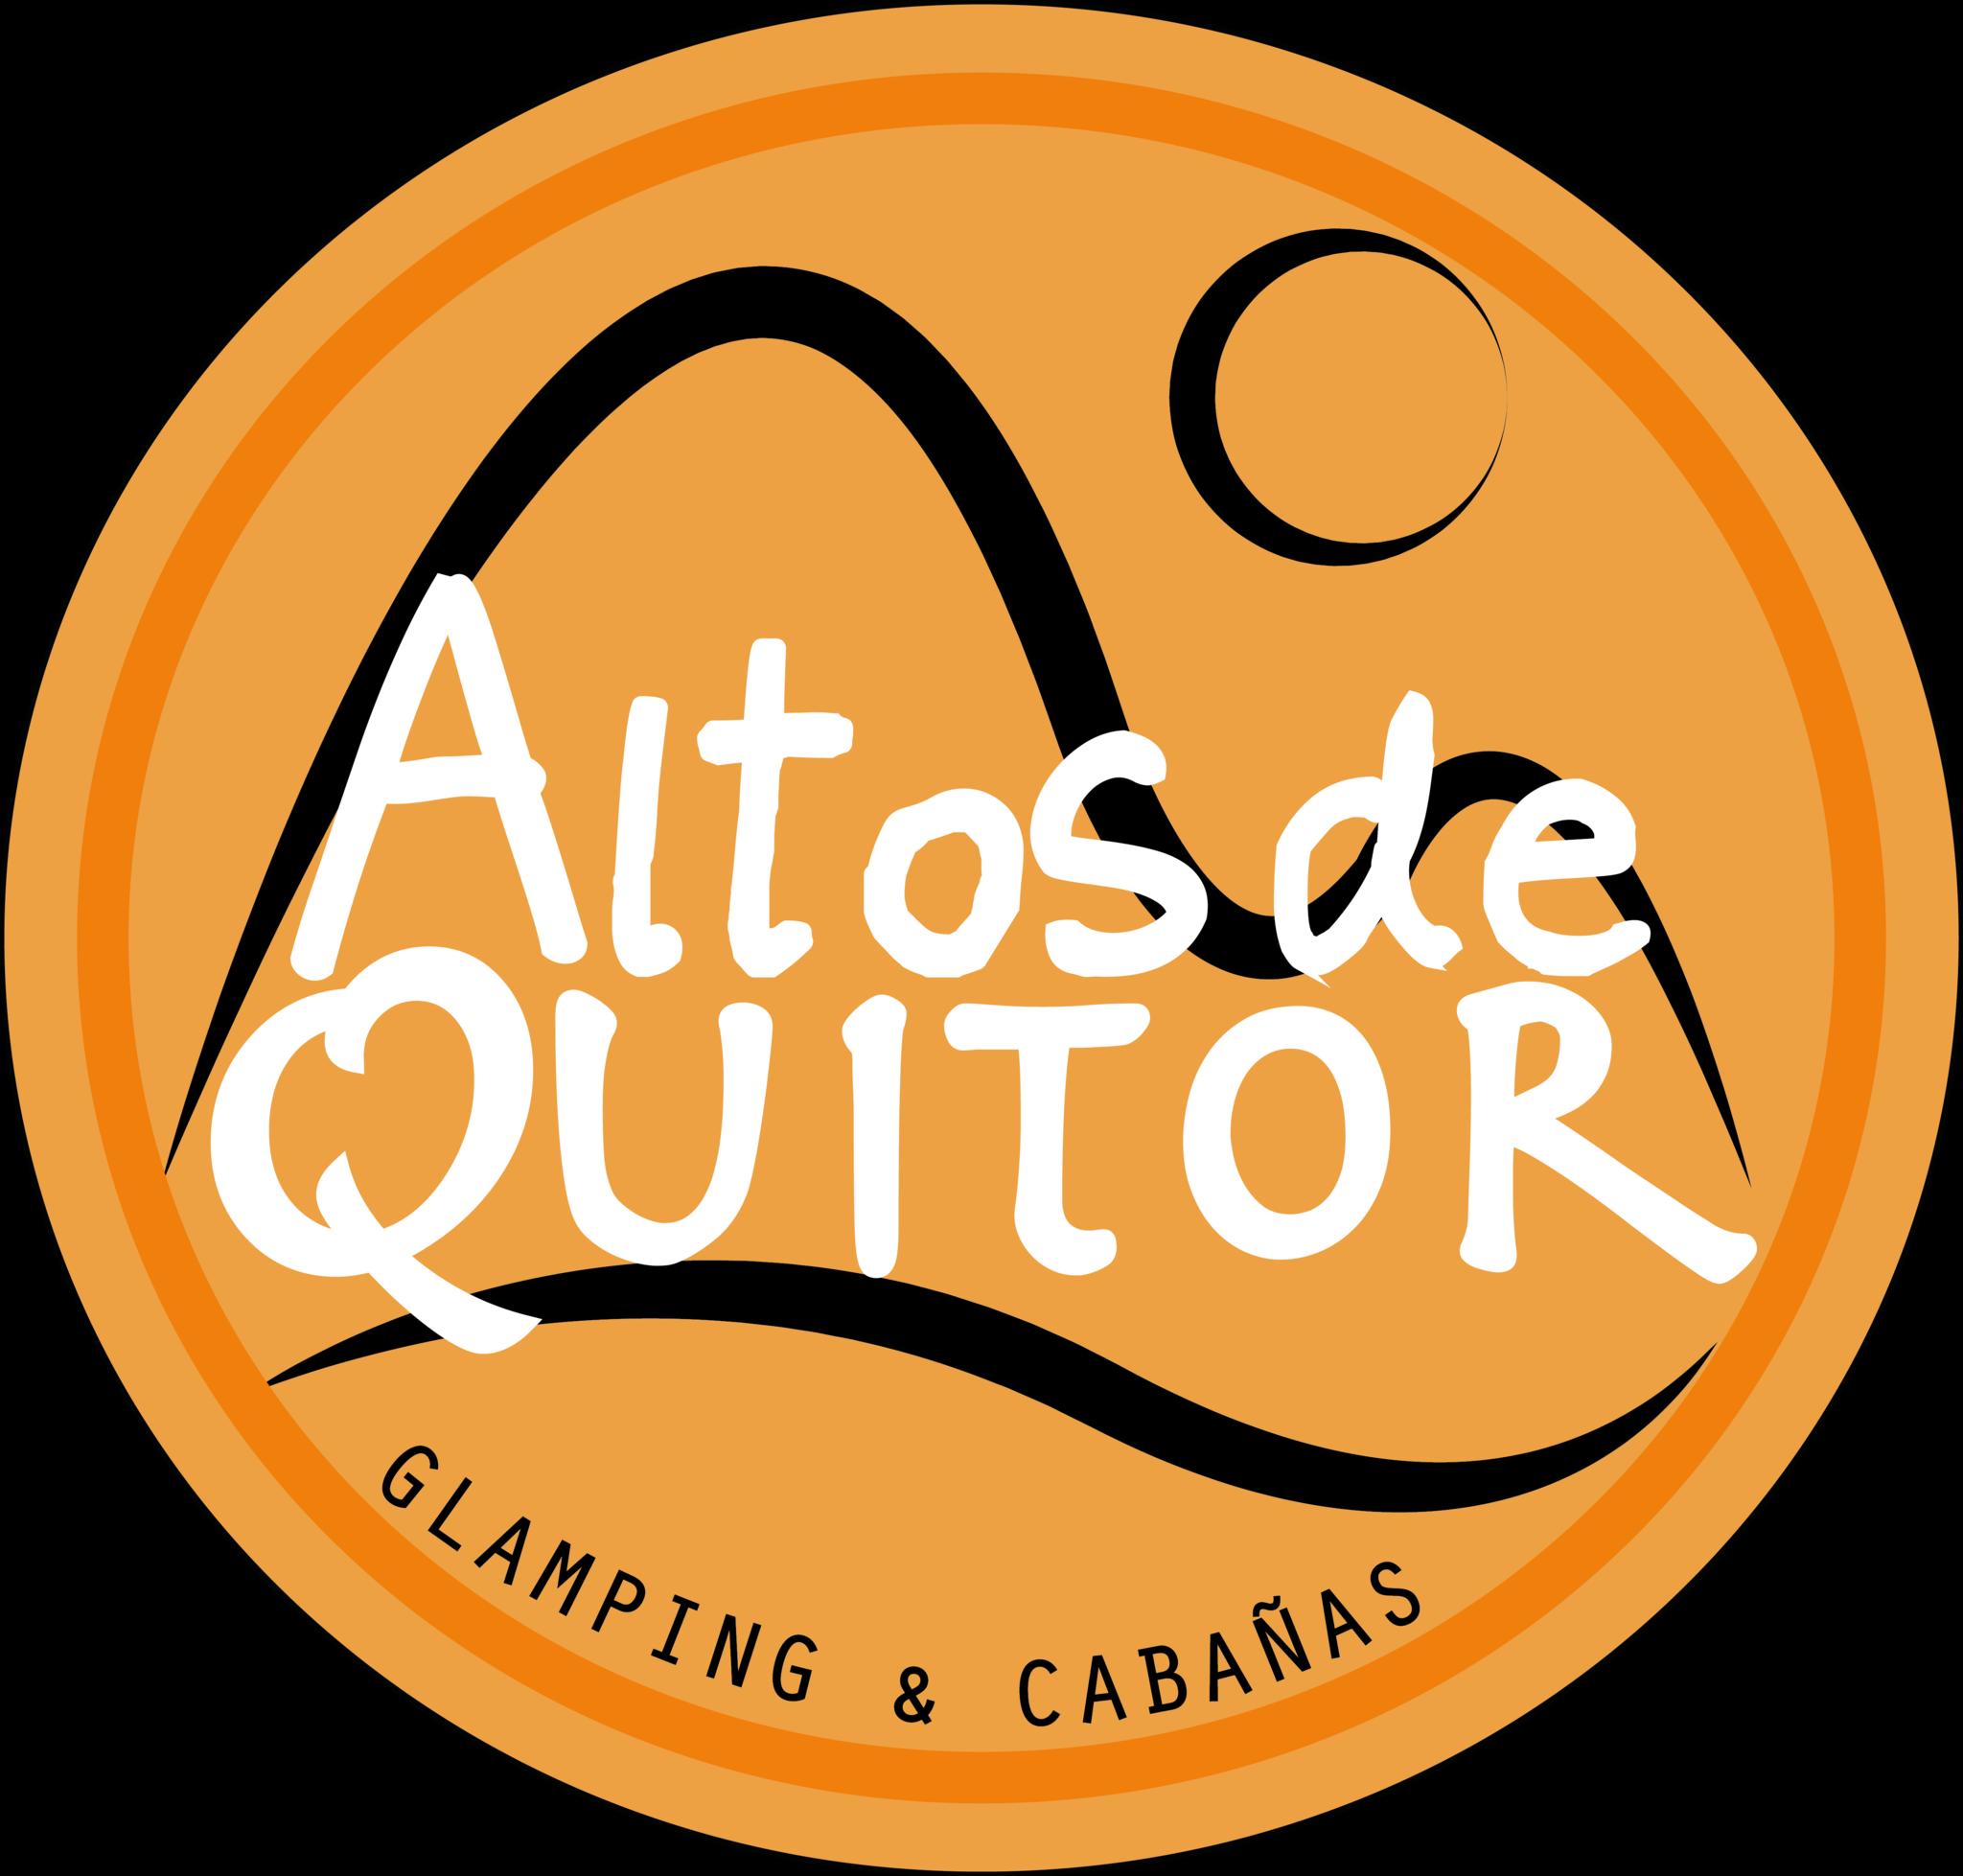 Altos de Quitor Glamping & Cabañas